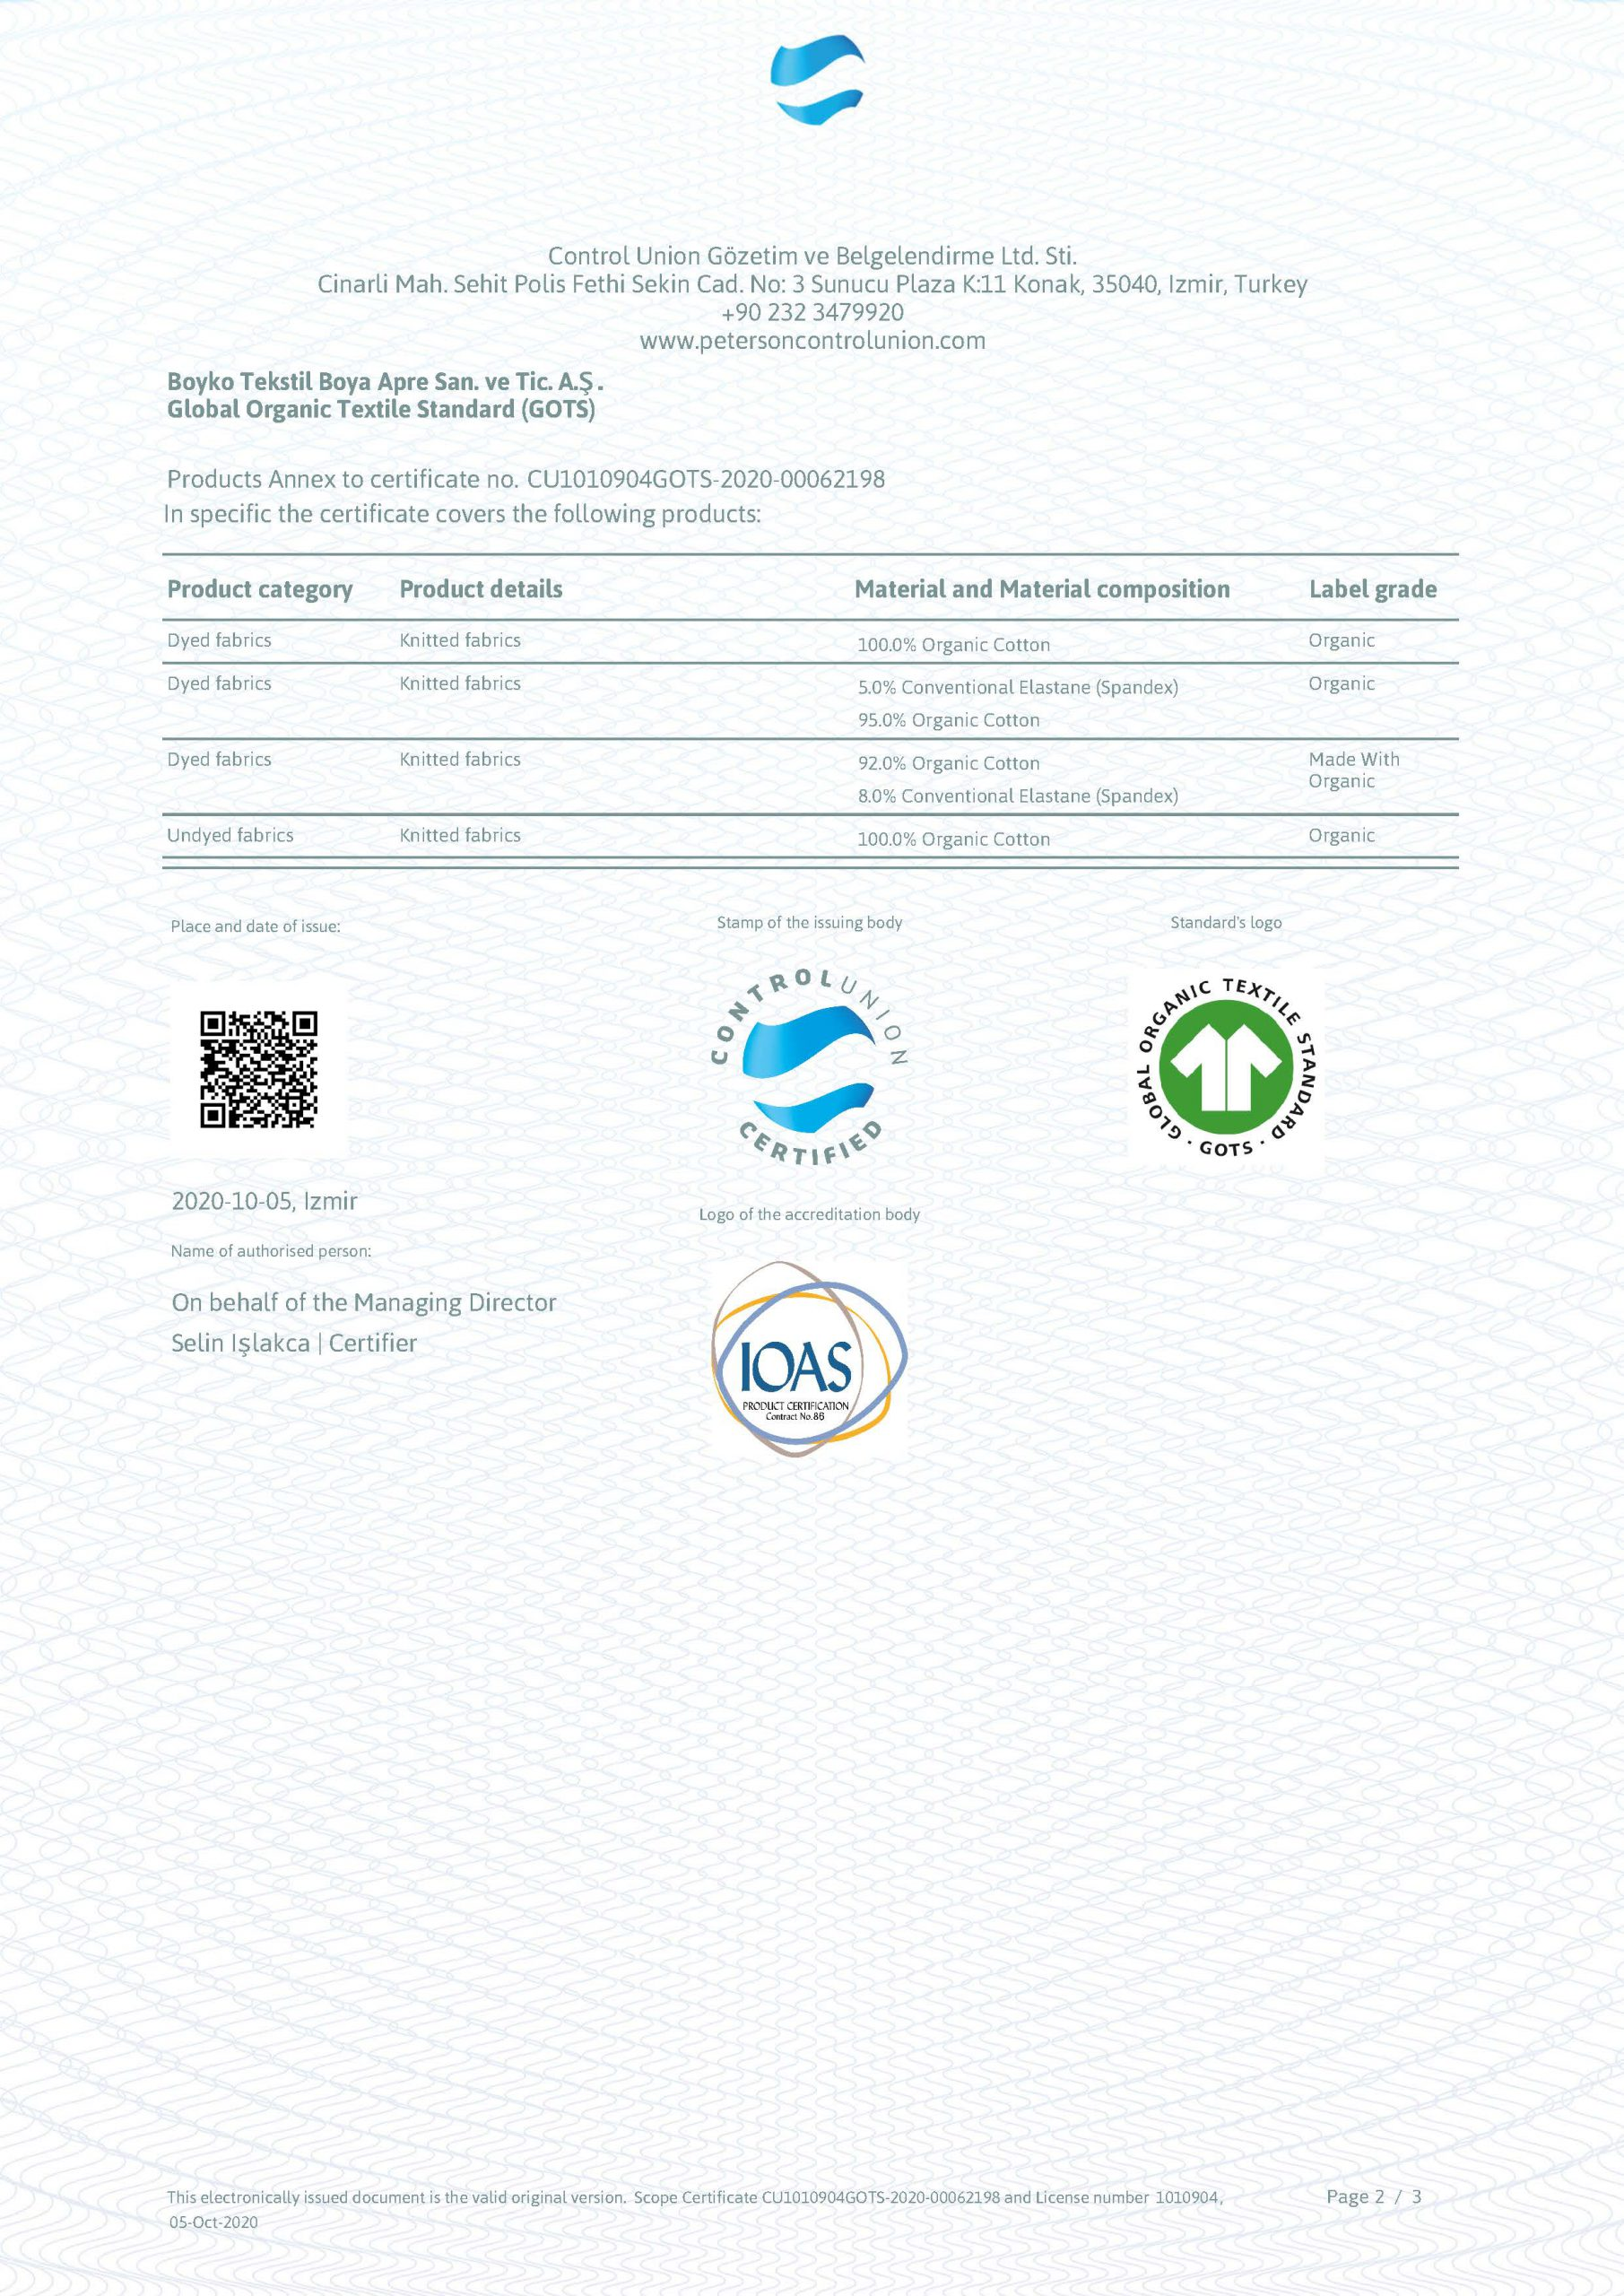 GOTS_Scope_Certificate_2020-10-05 16_56_56 UTC_Page_2